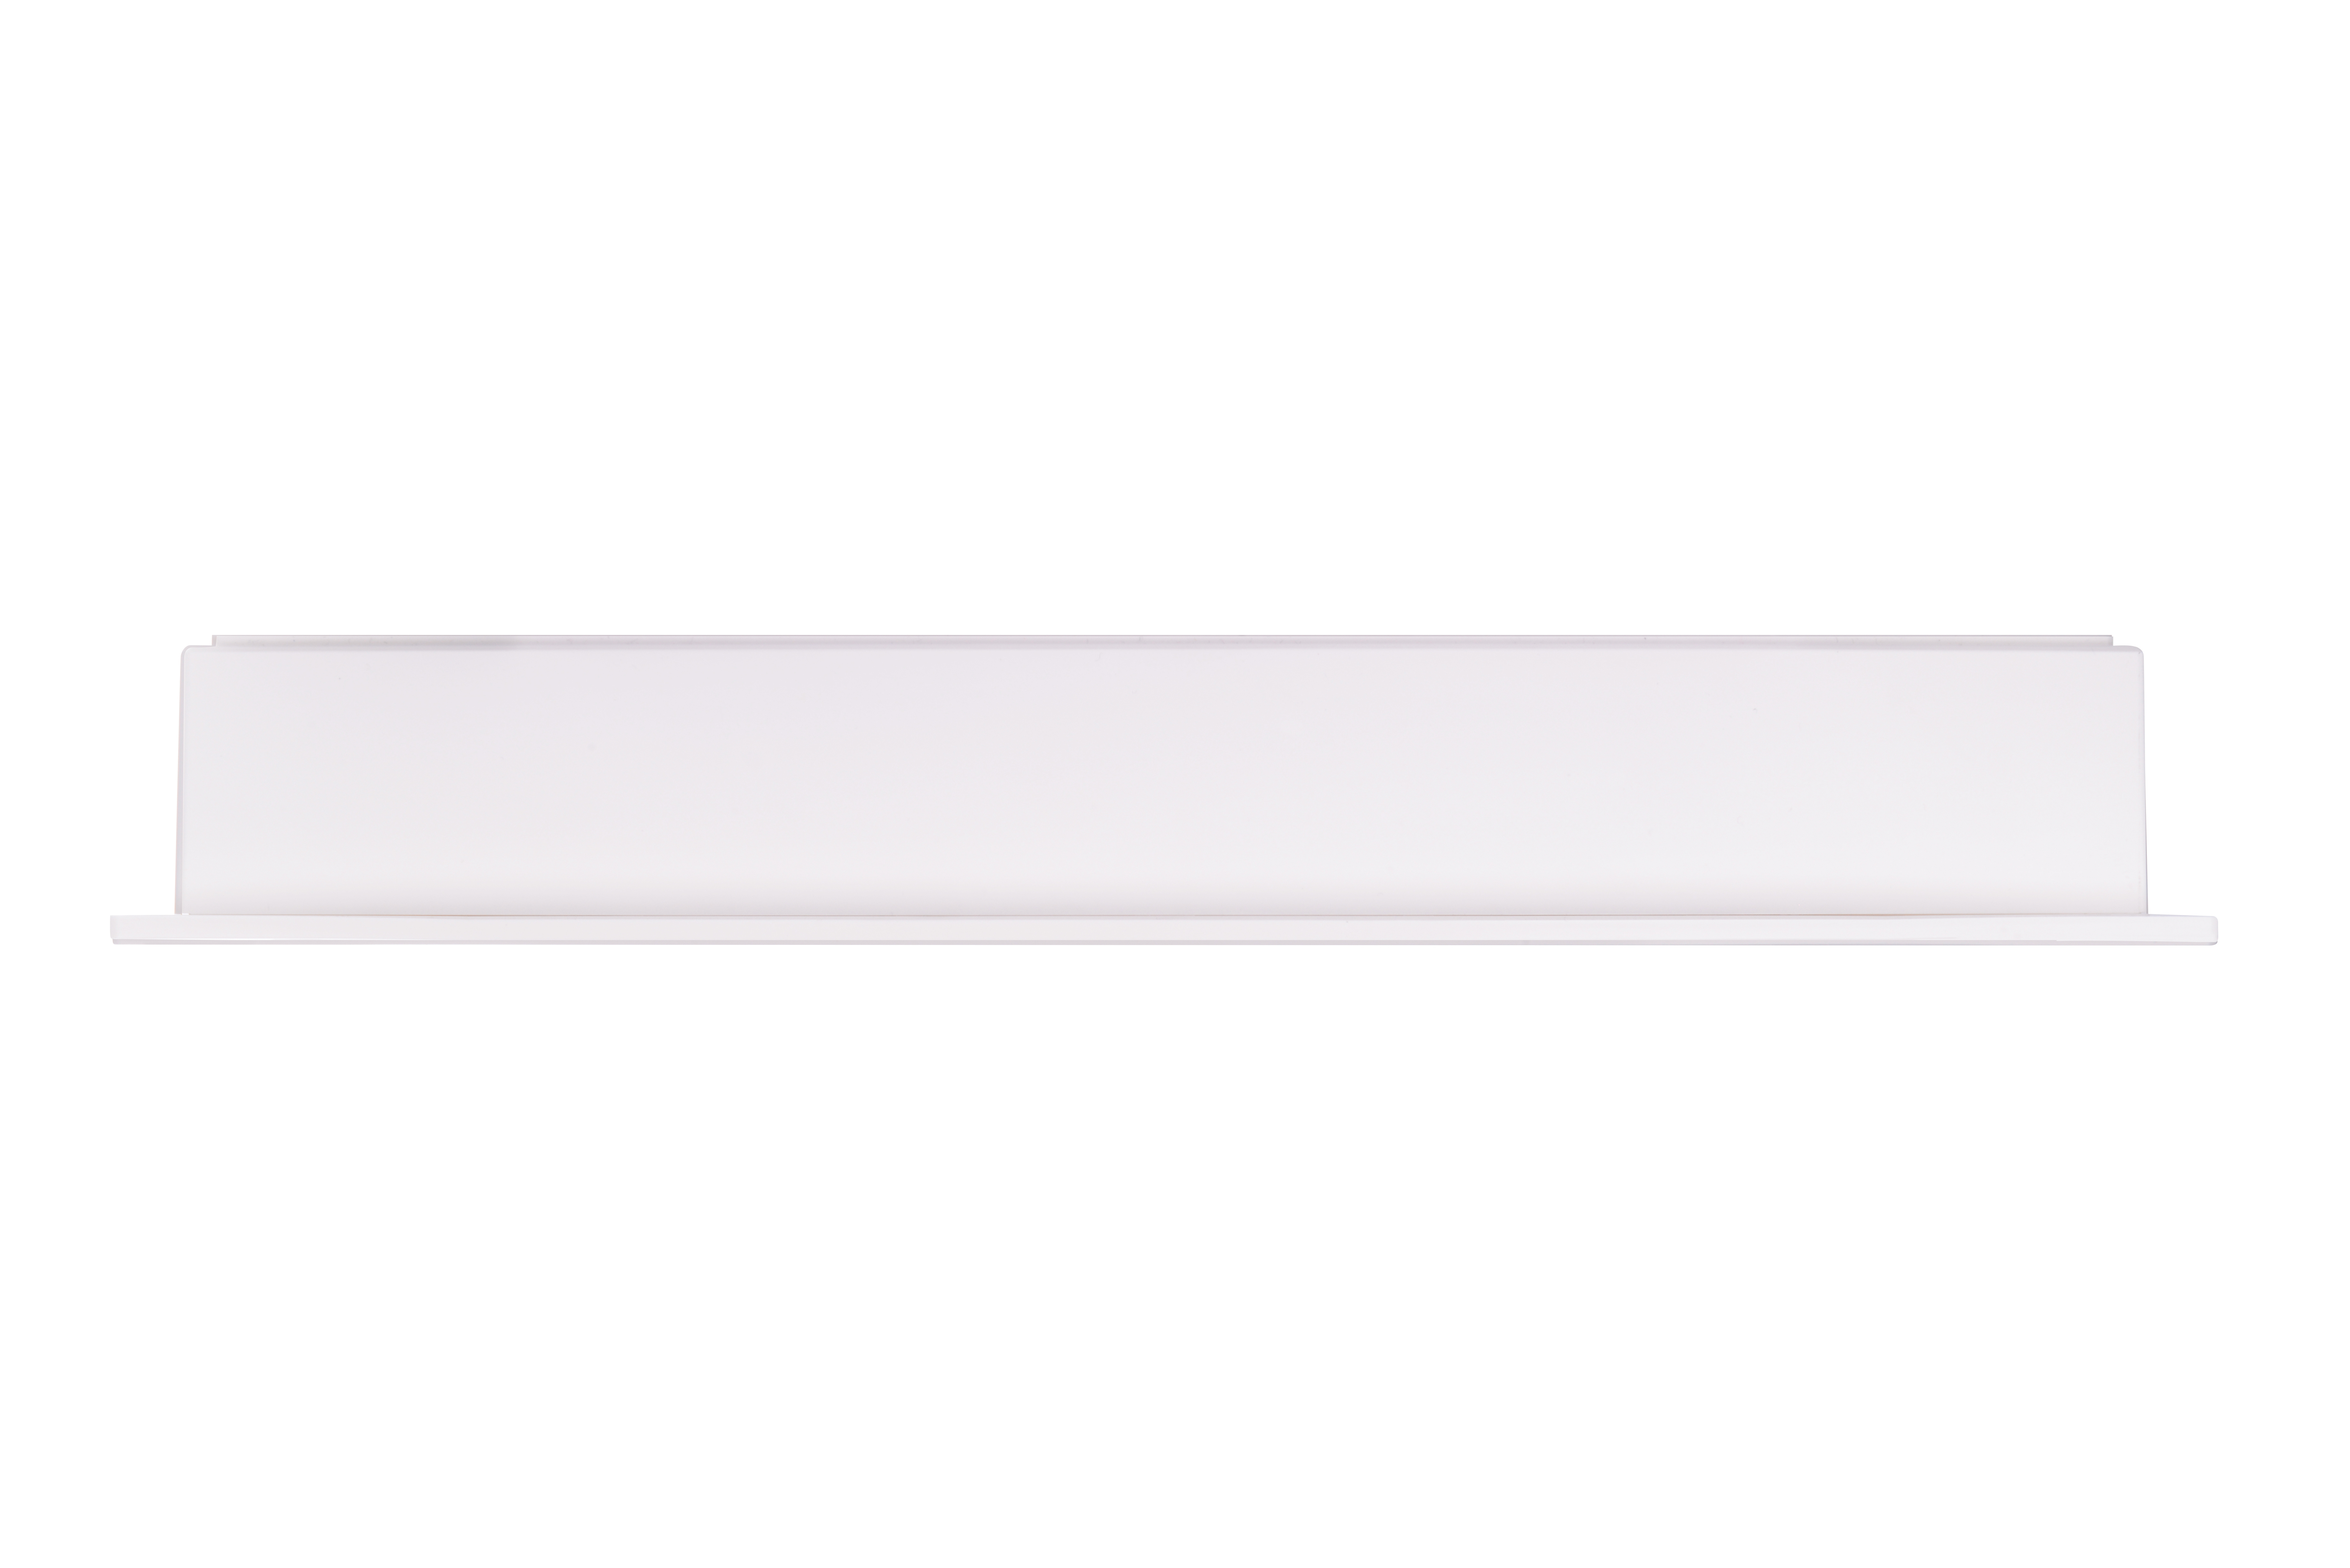 Lampa emergenta led Intelight 94756   3h mentinut test automat 5